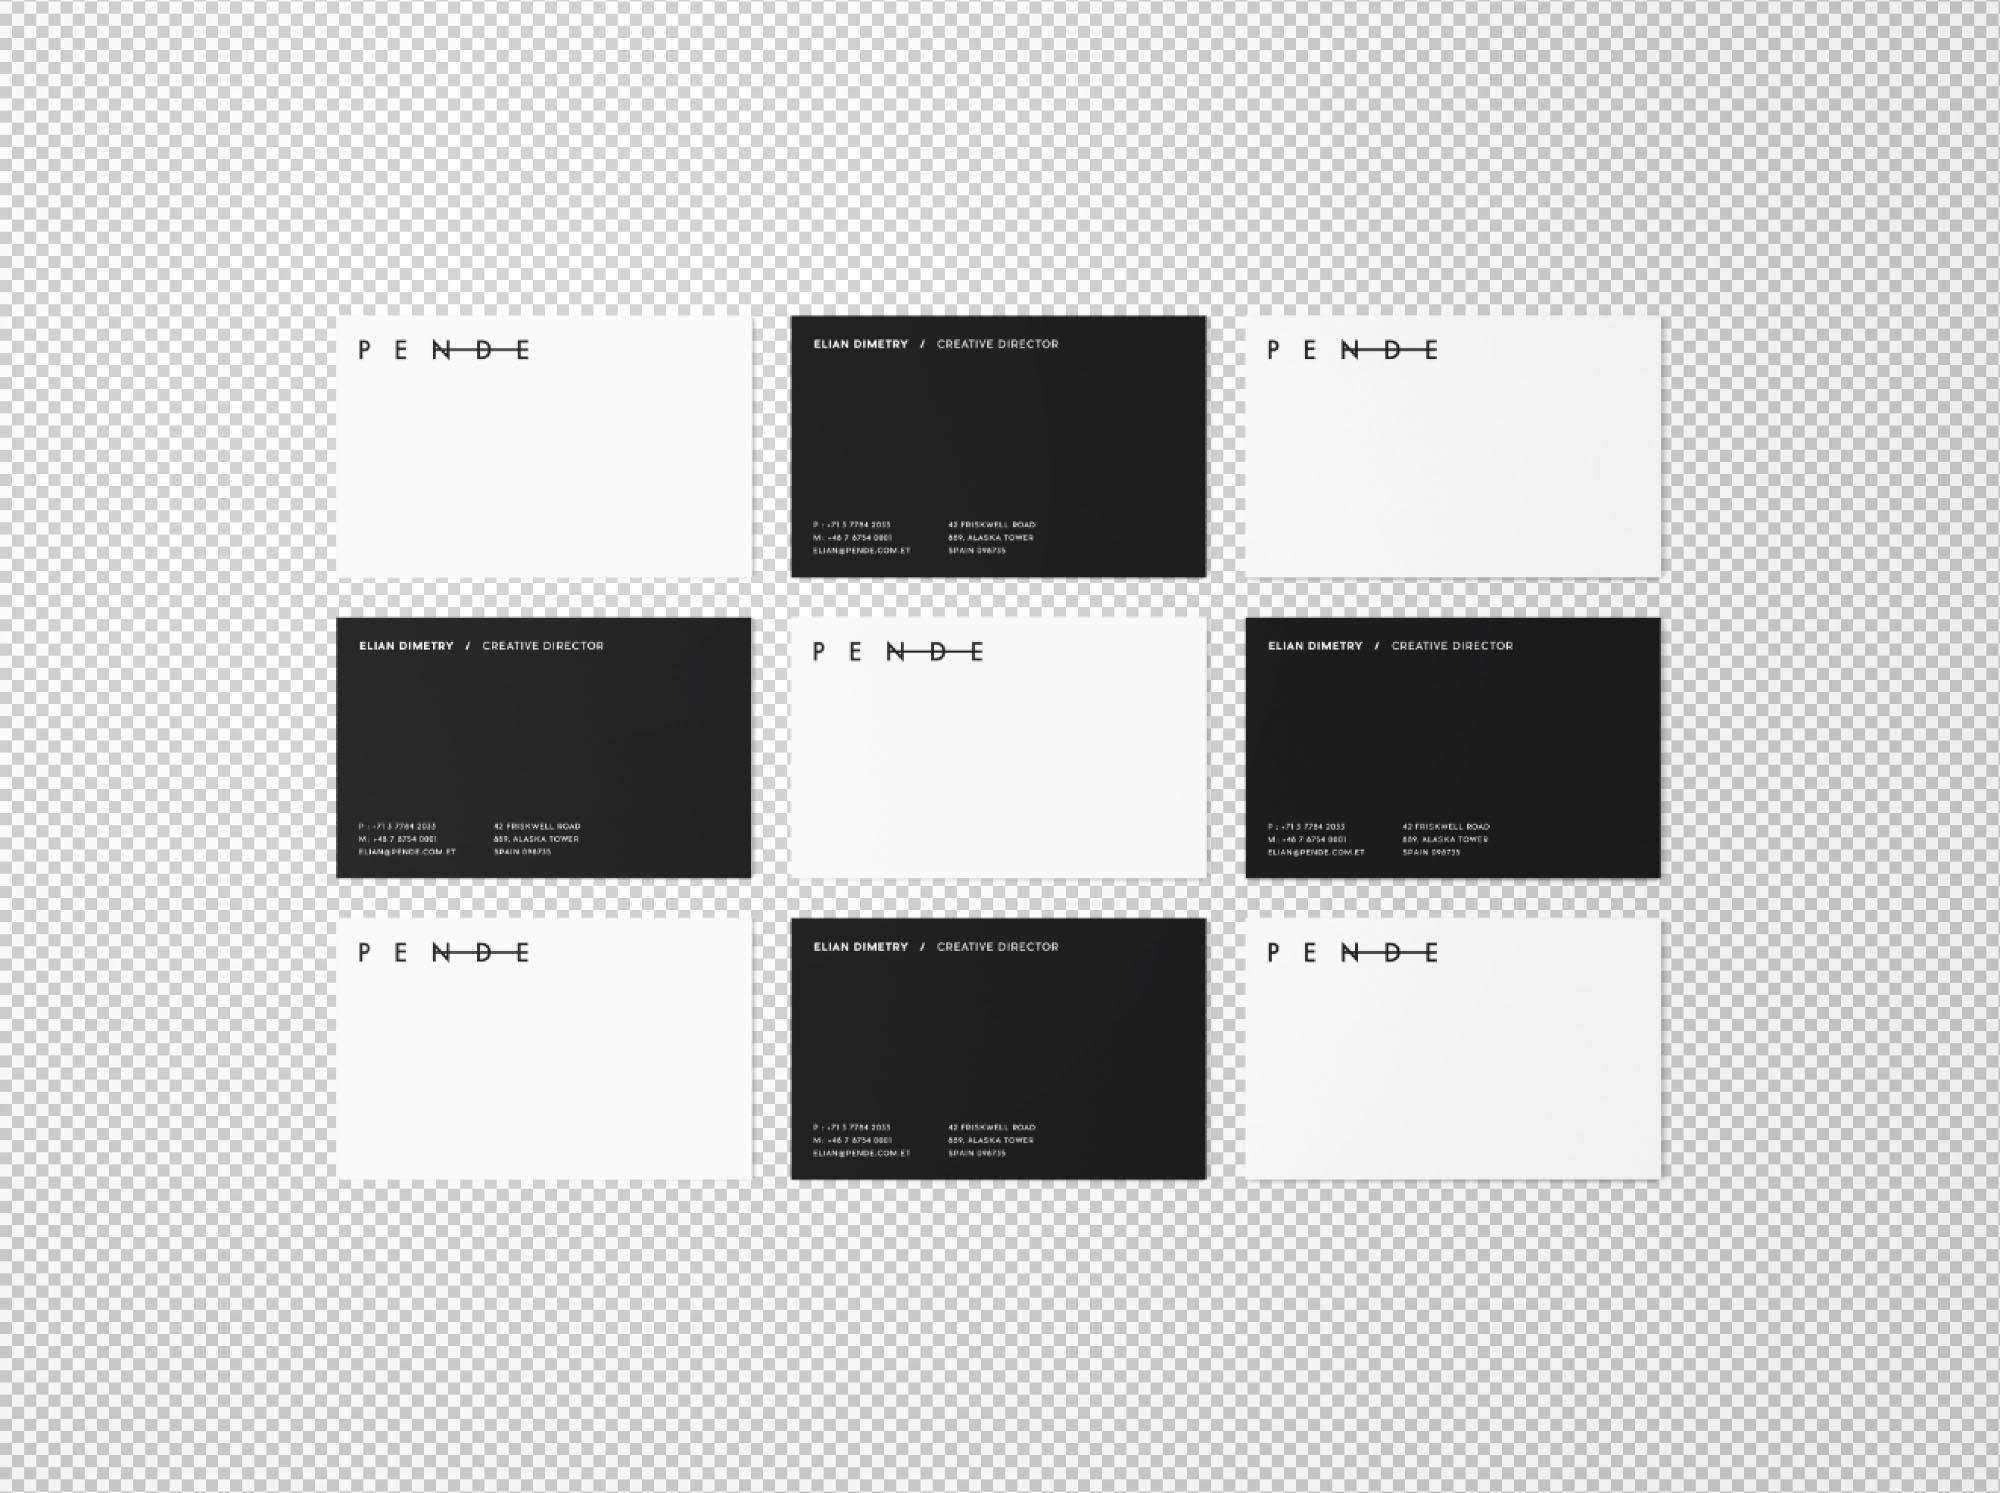 Uniform Business Cards Mockup - Transparent